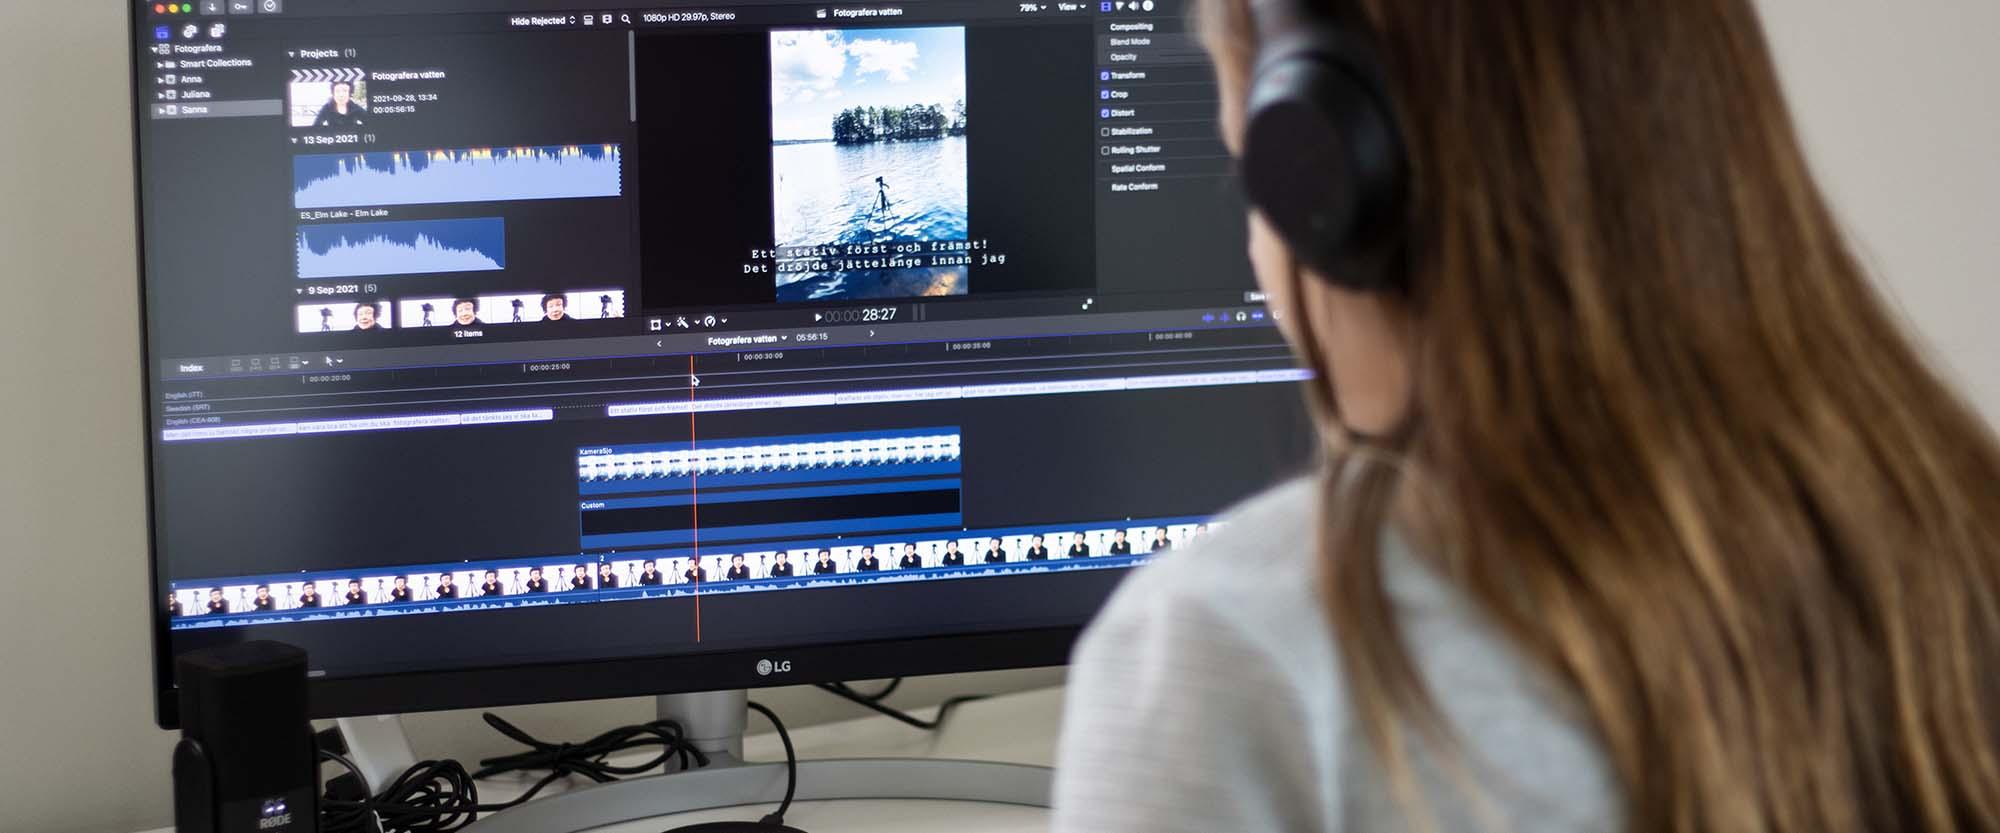 Onlinekurs Undertexta i Final Cut Pro X